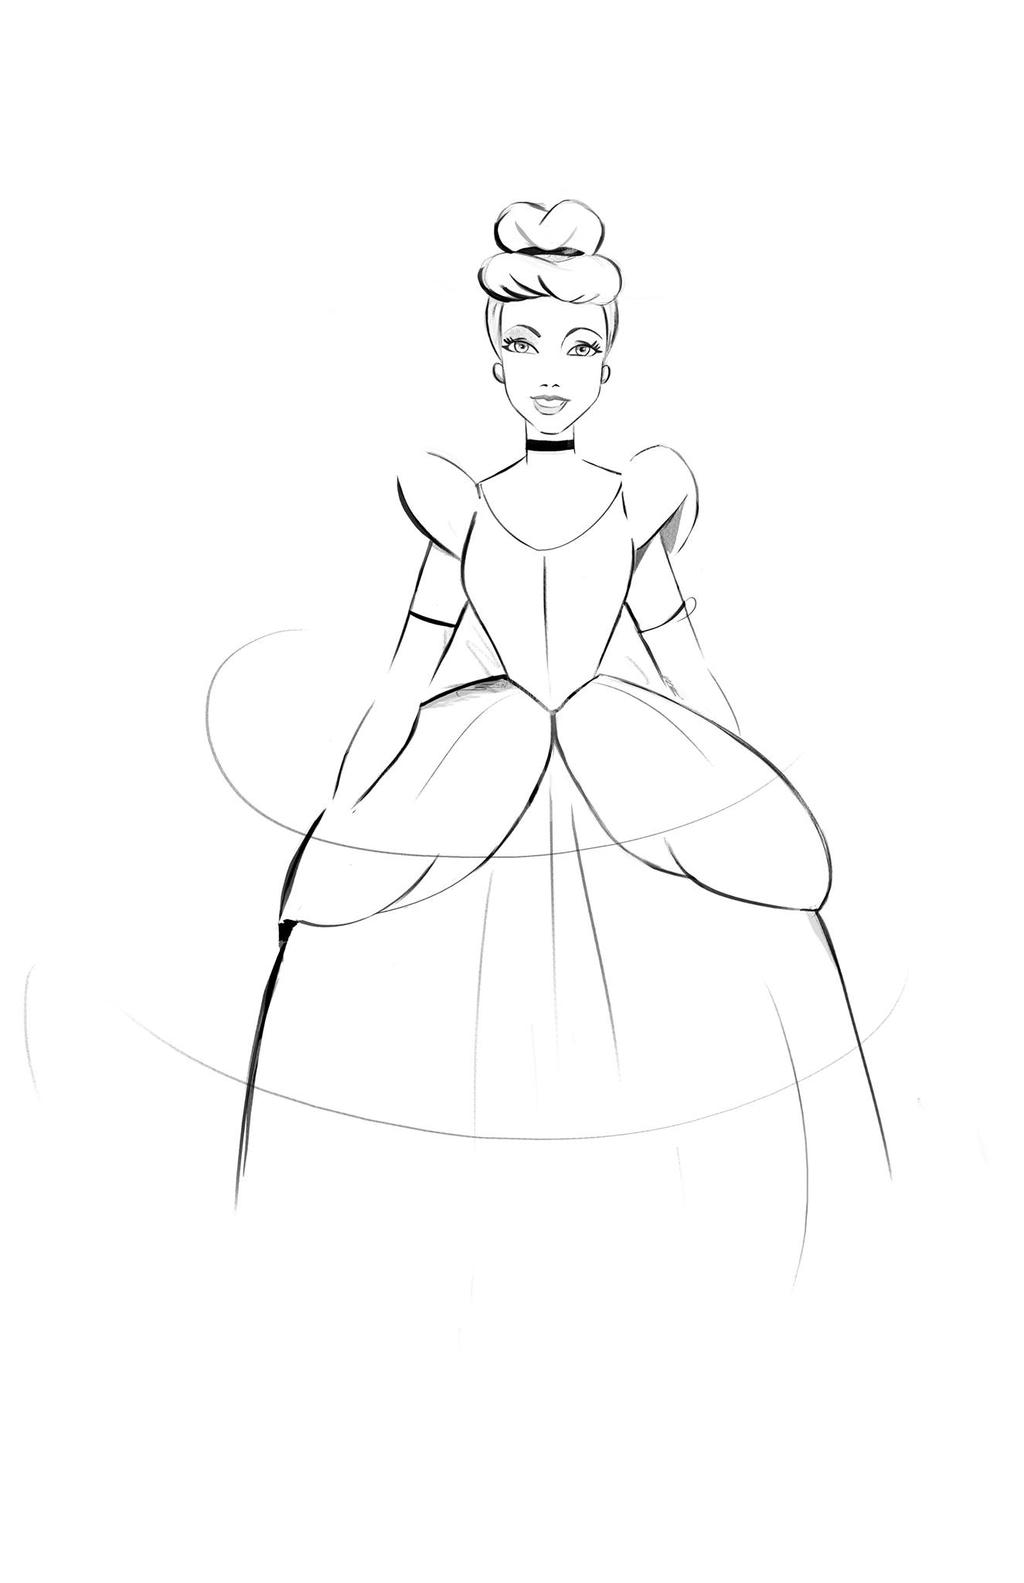 Cinderella doodle by didouchafik on DeviantArt